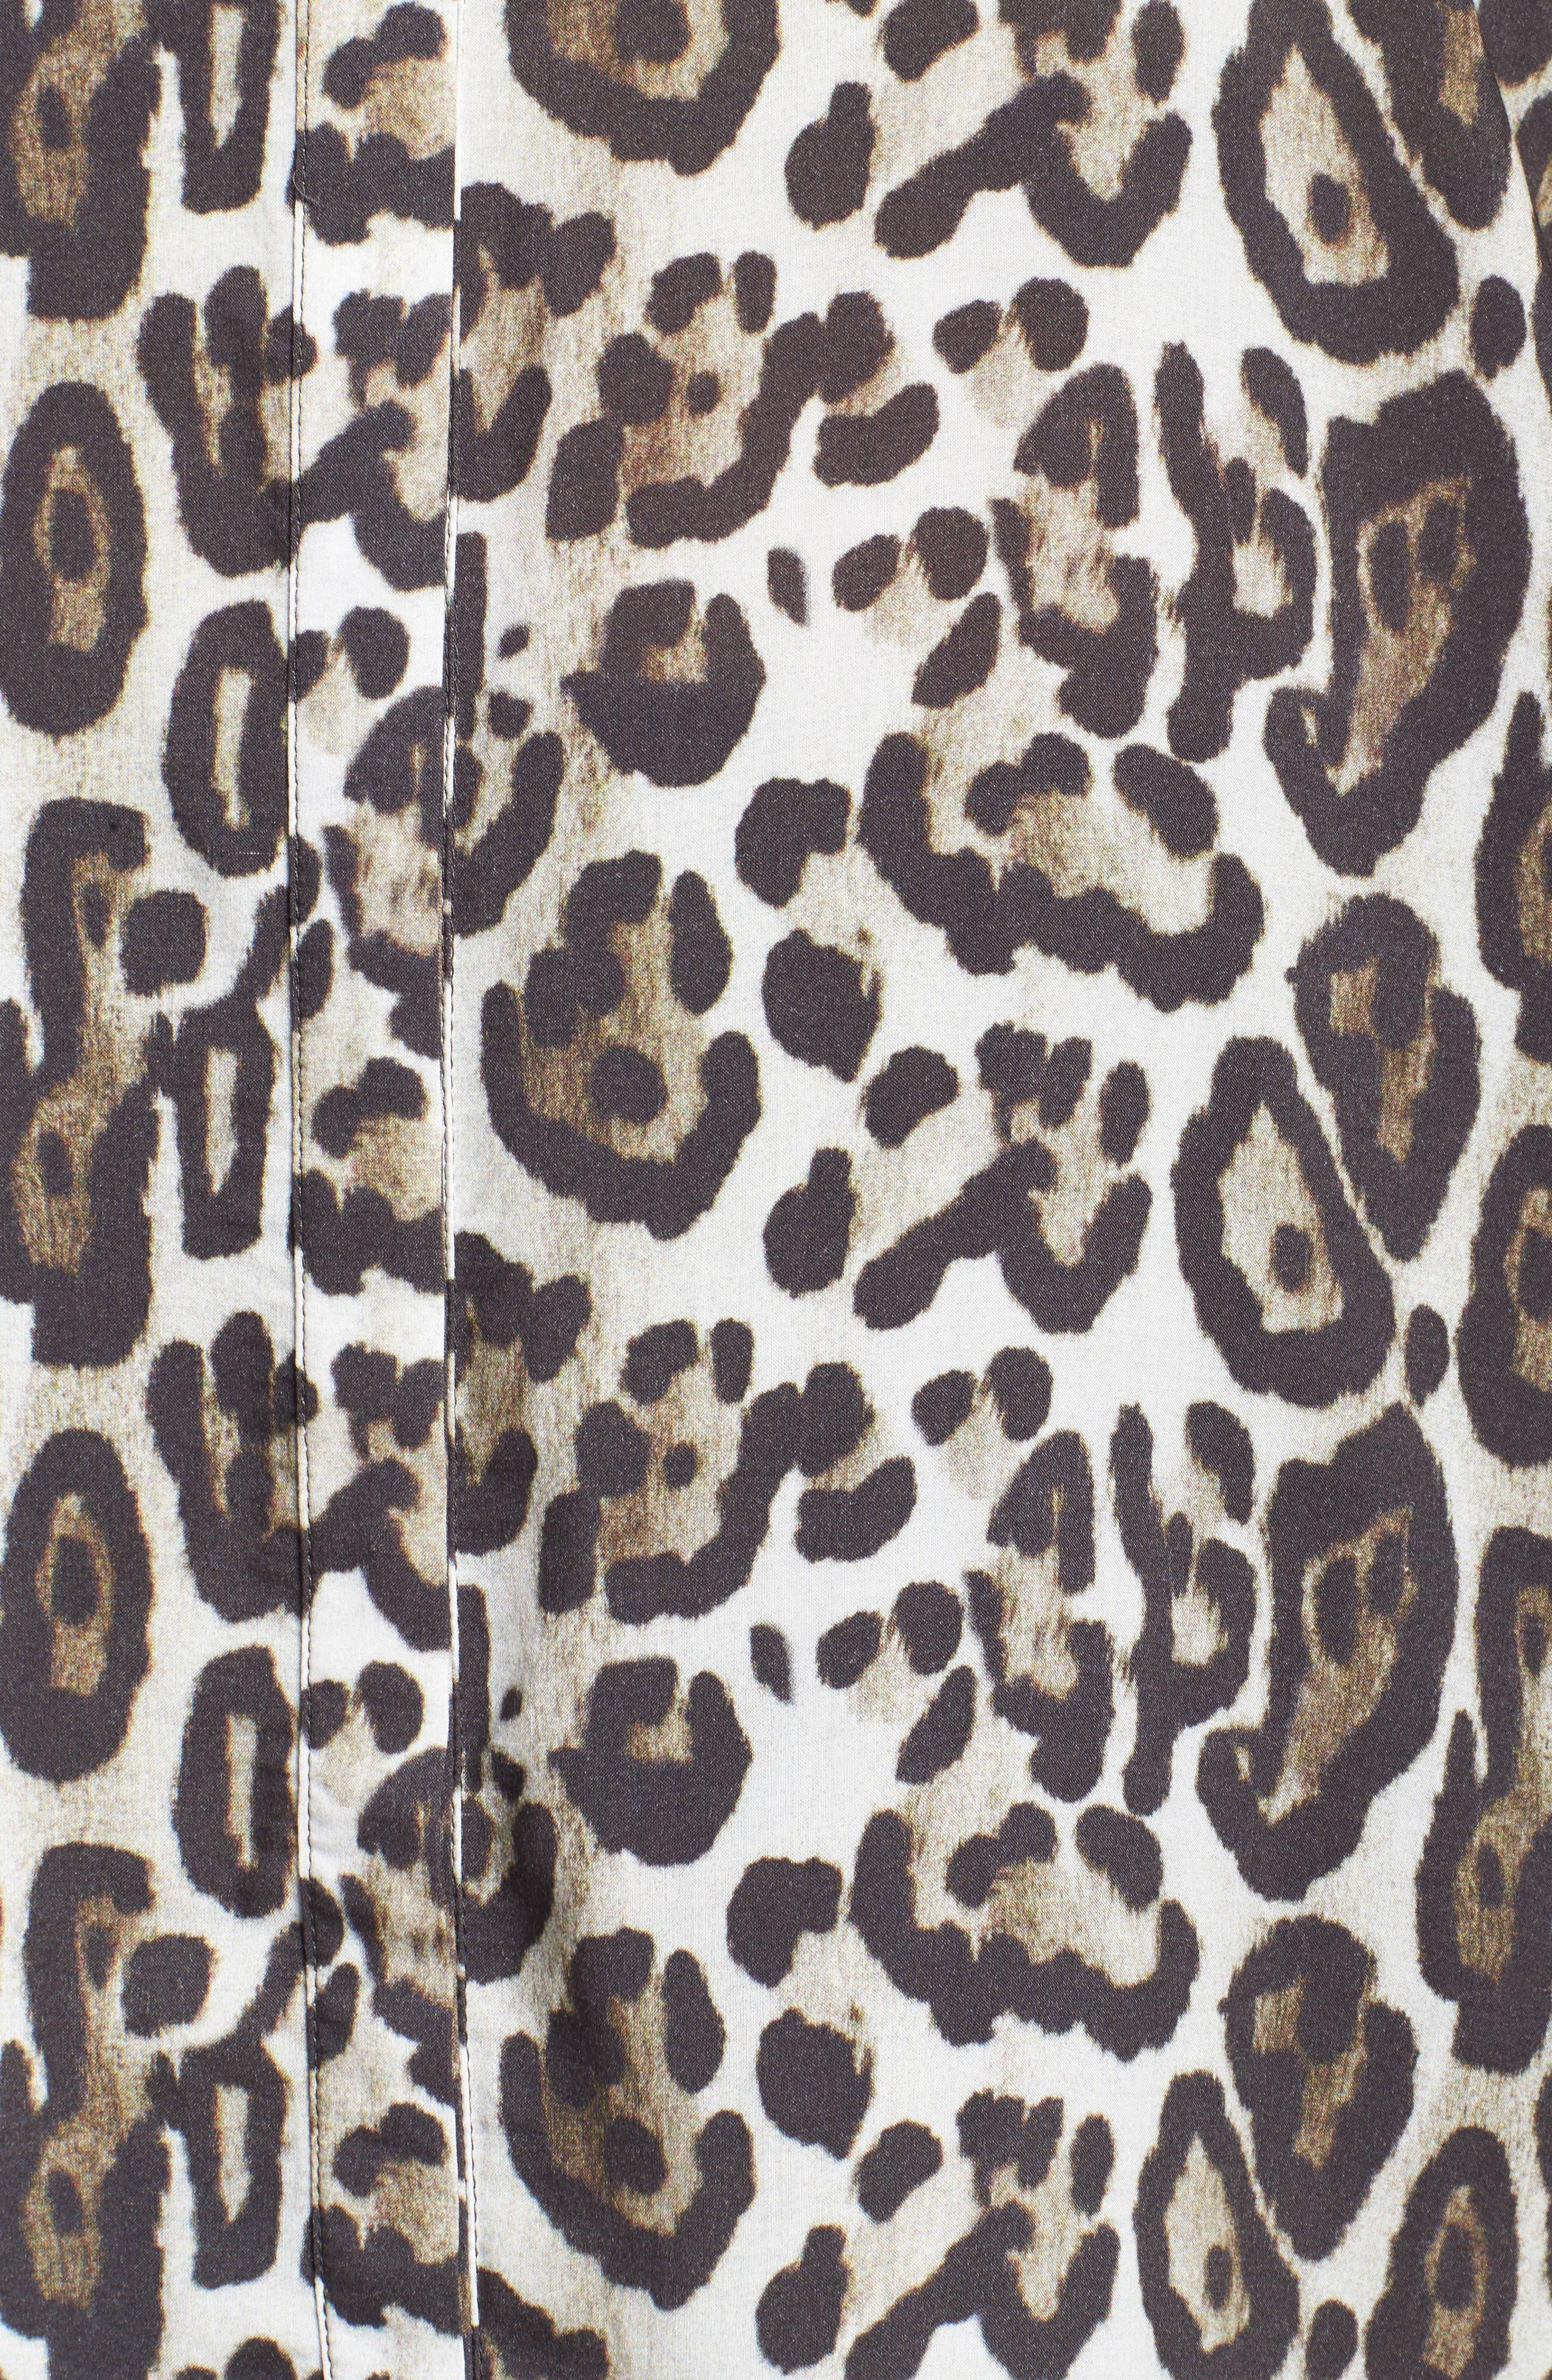 Oversize Leopard Print Blouse,                             Alternate thumbnail 5, color,                             Black/ Multi